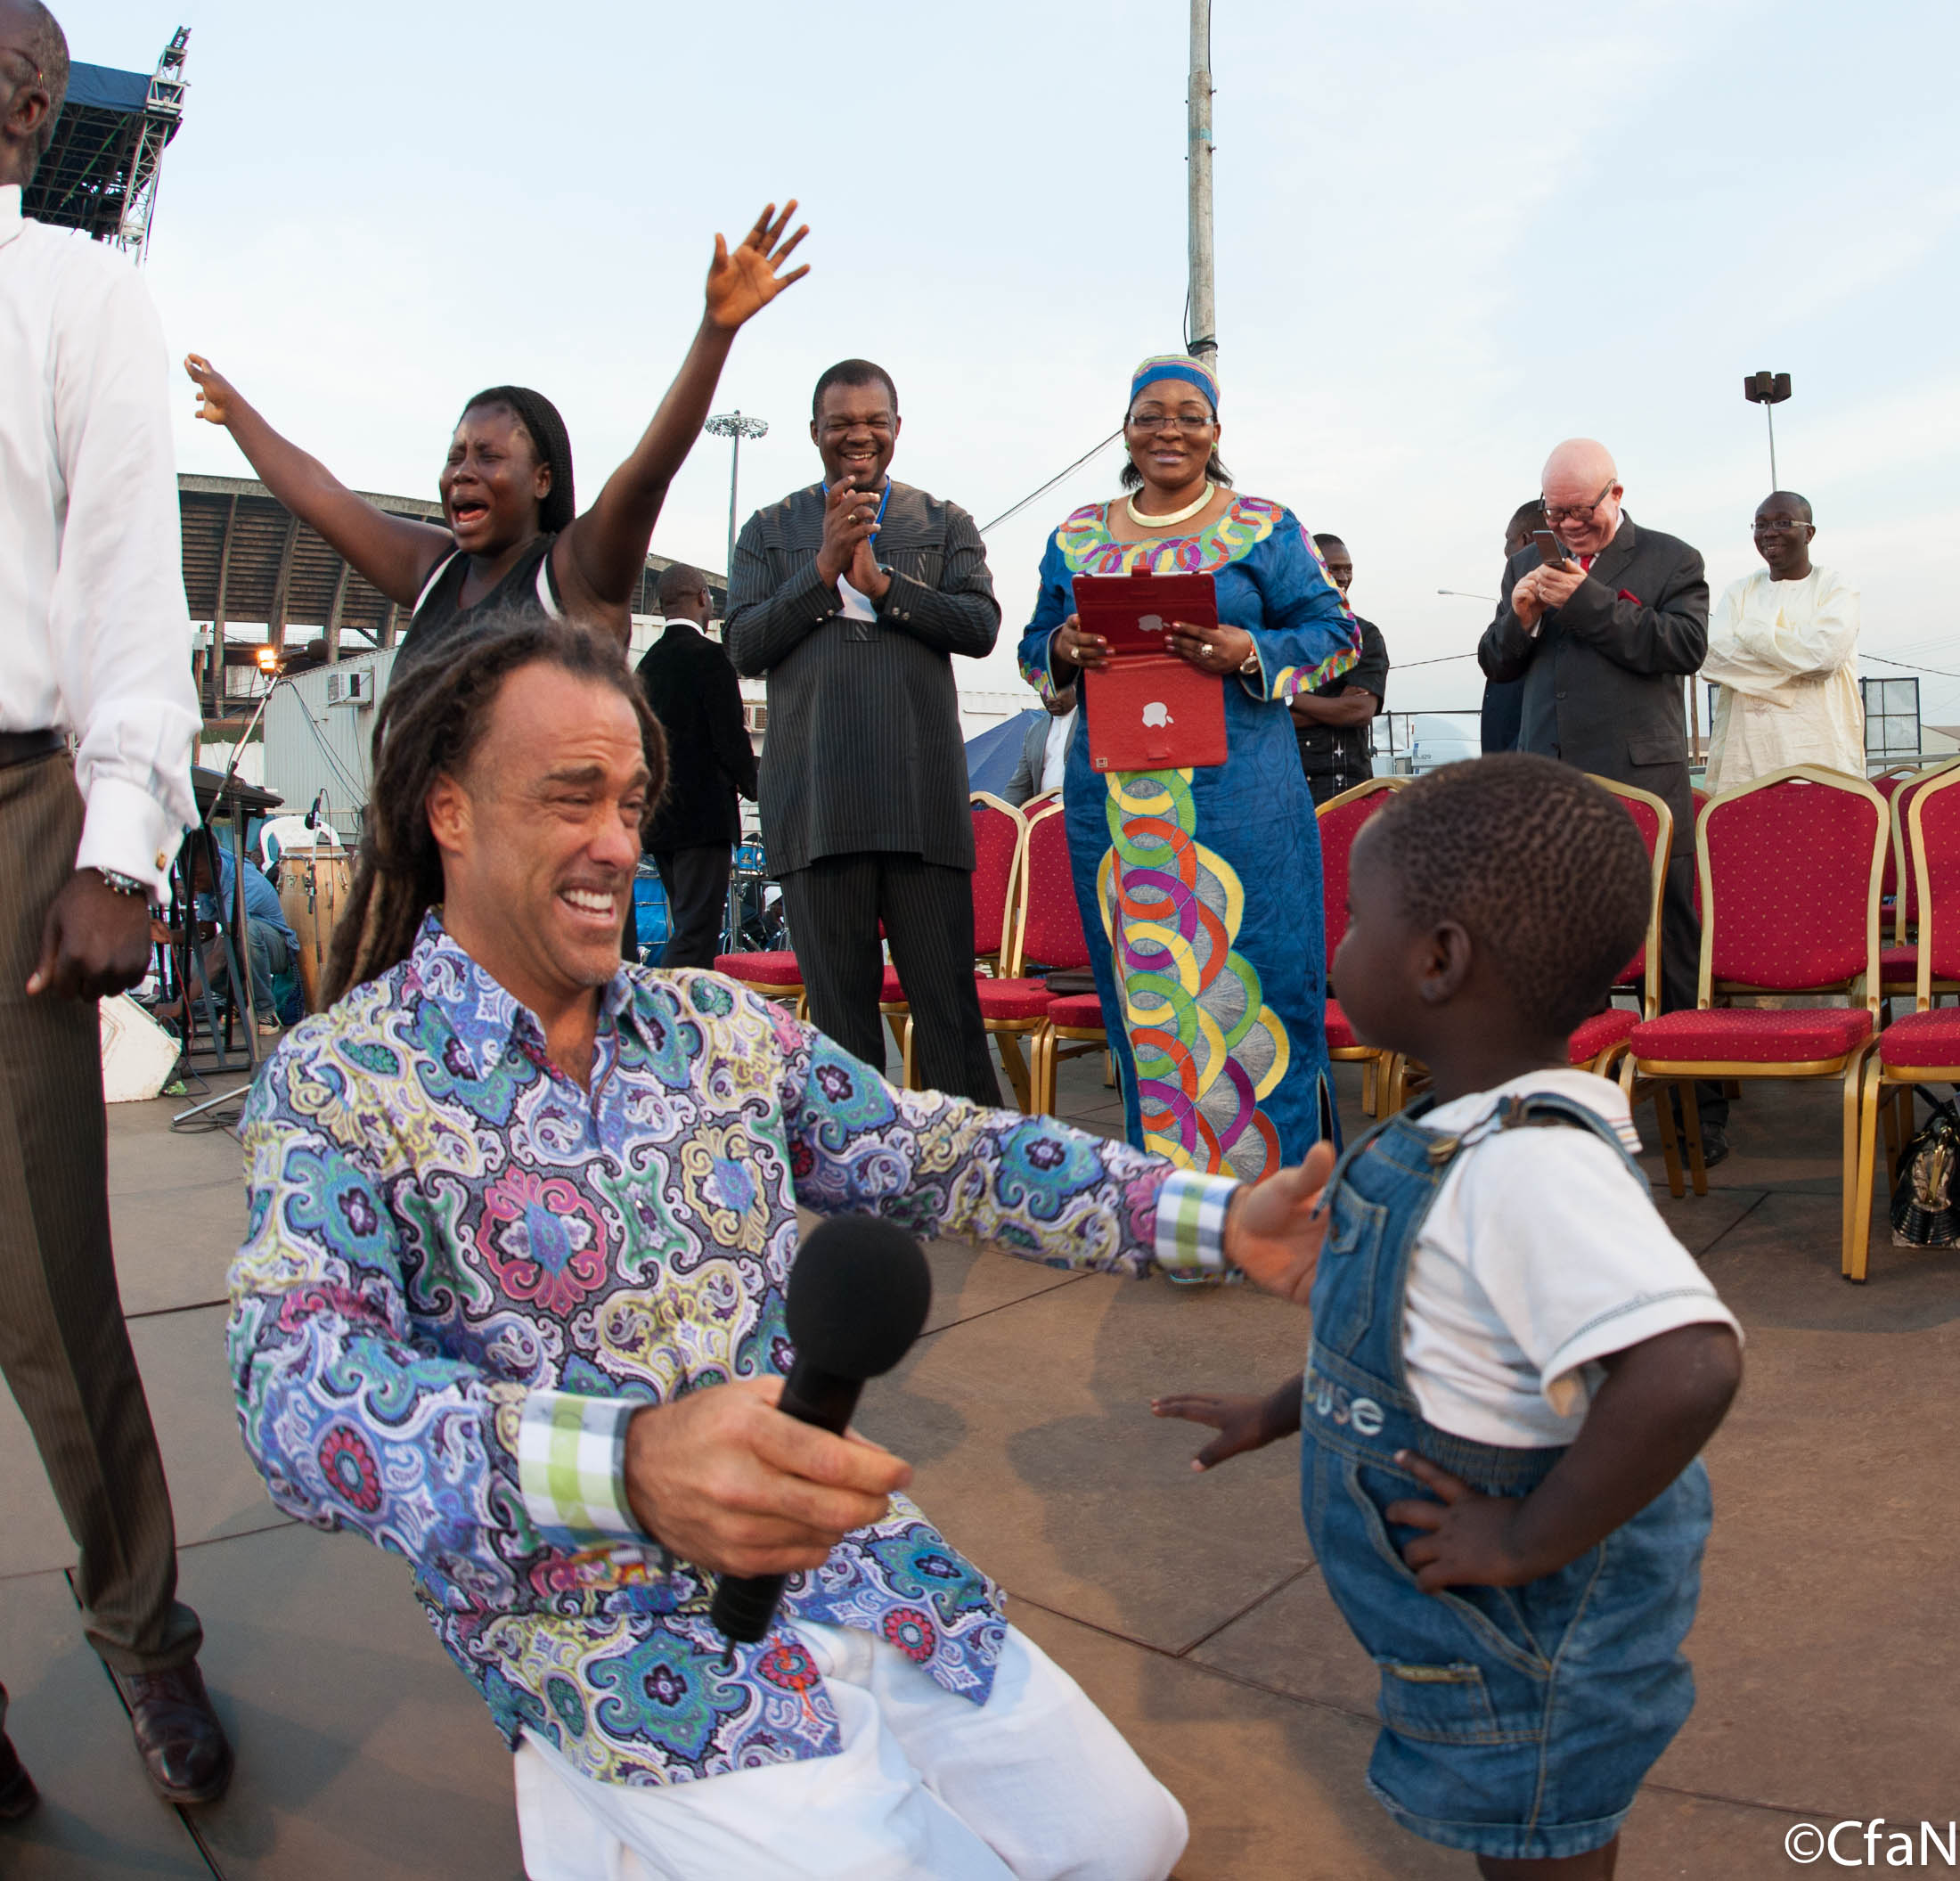 Cameroon_2013-D3M-4166